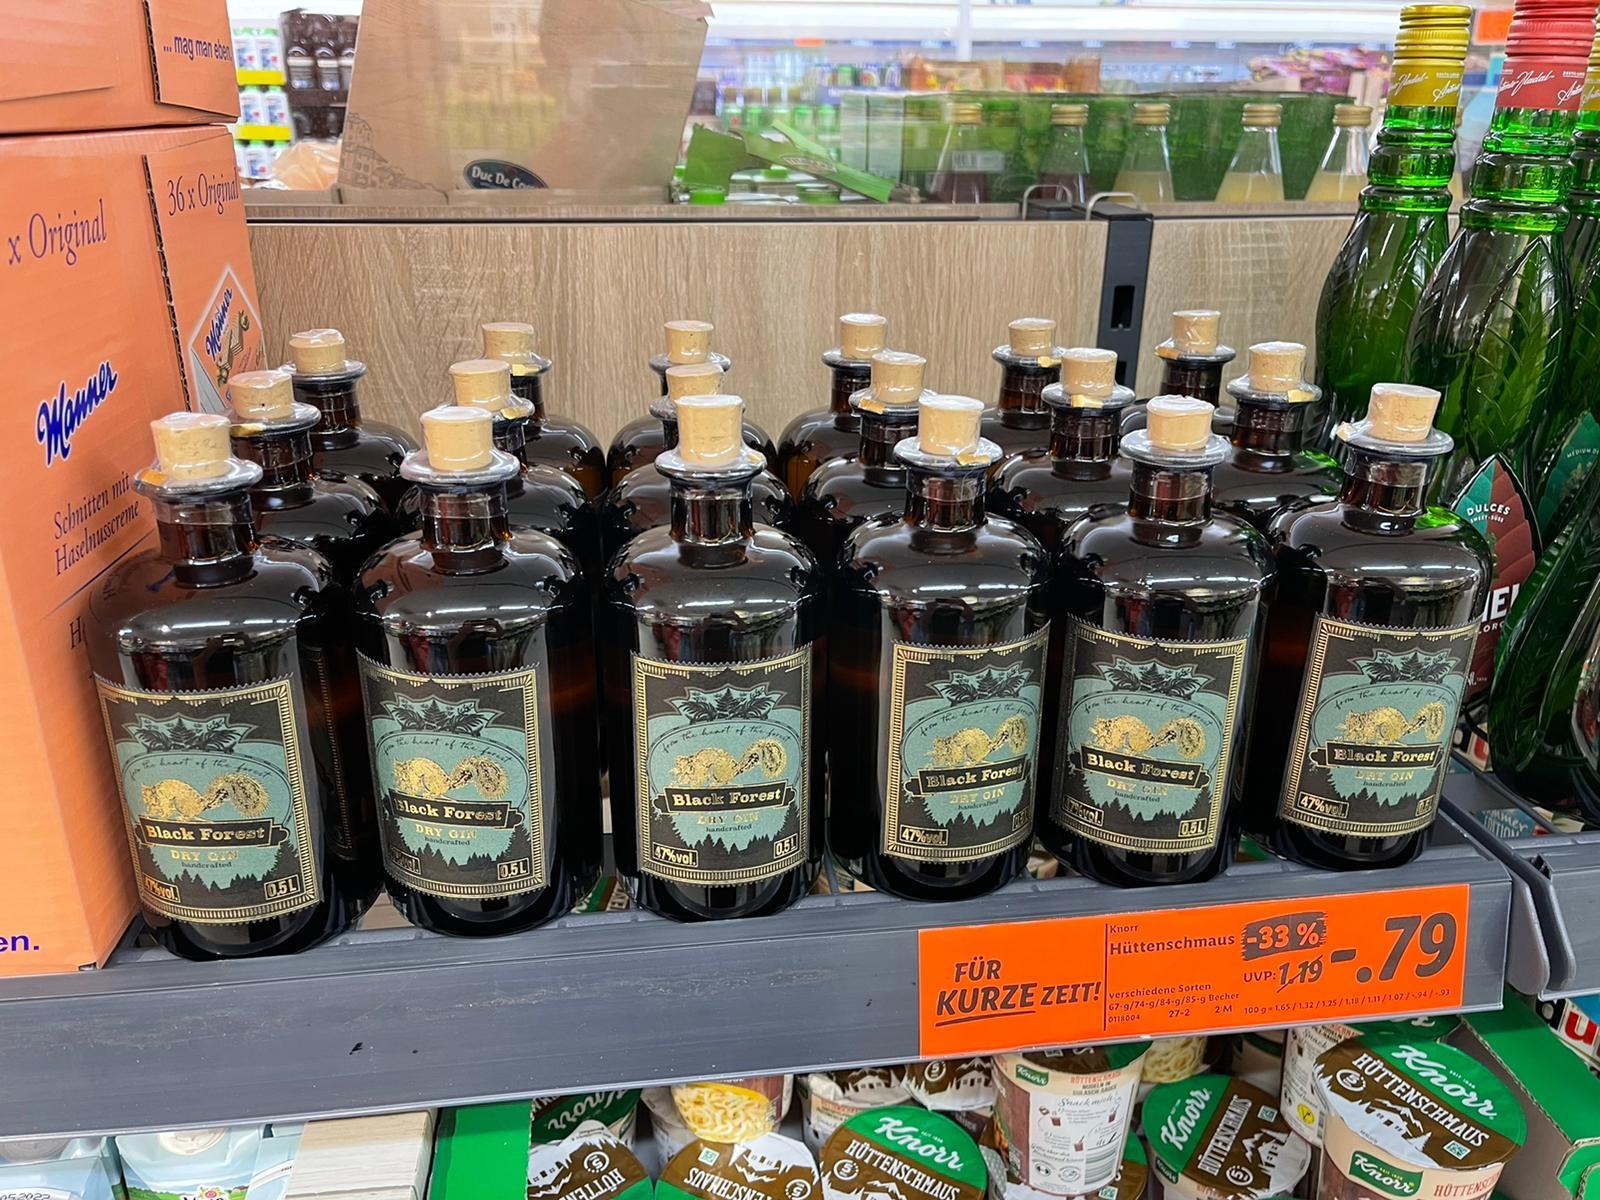 Lidl Black Forest Gin